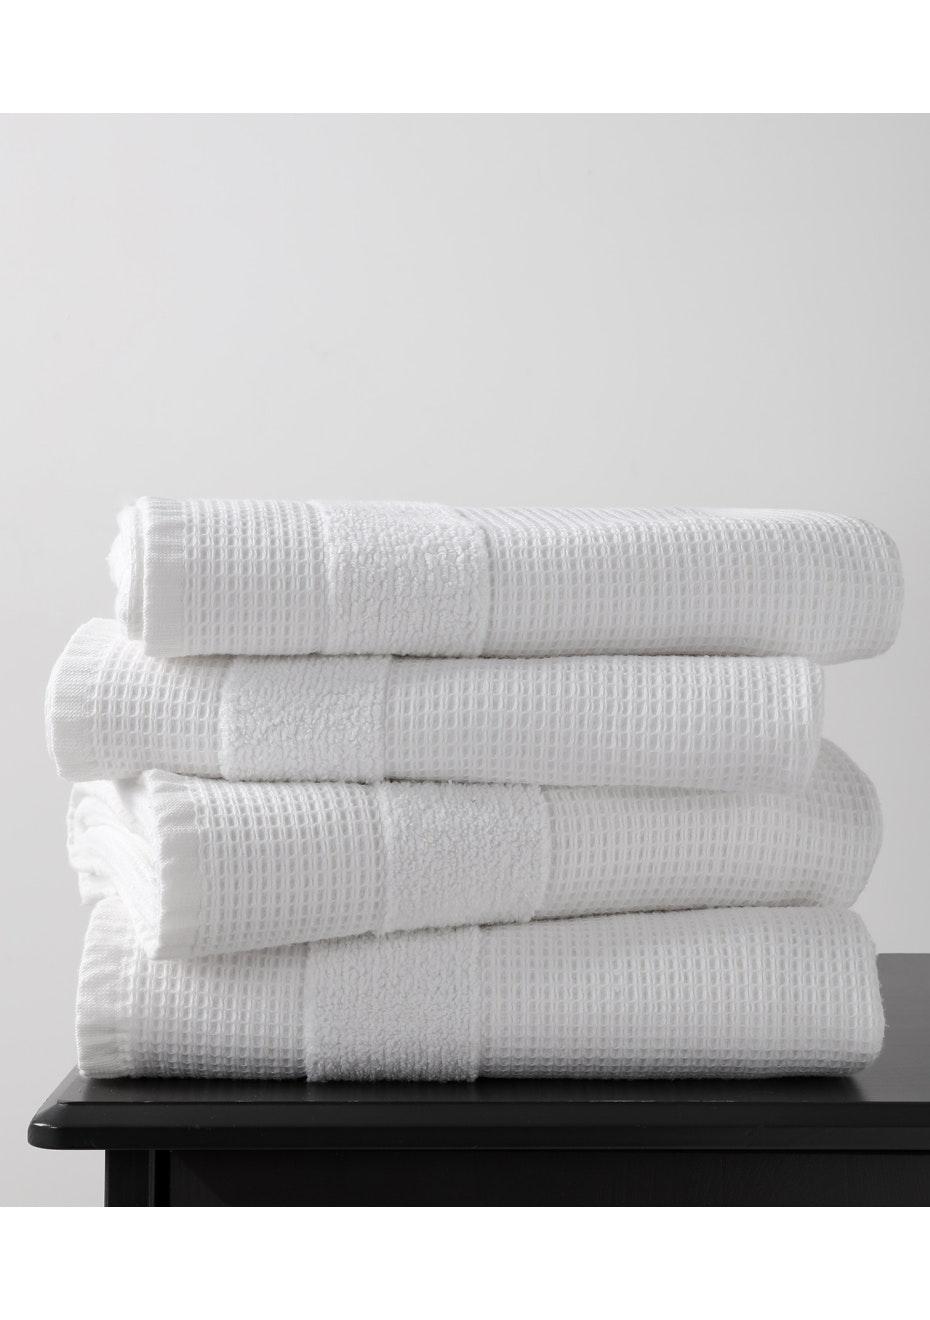 2 Pack White 600gsm Waffle Bath Sheet